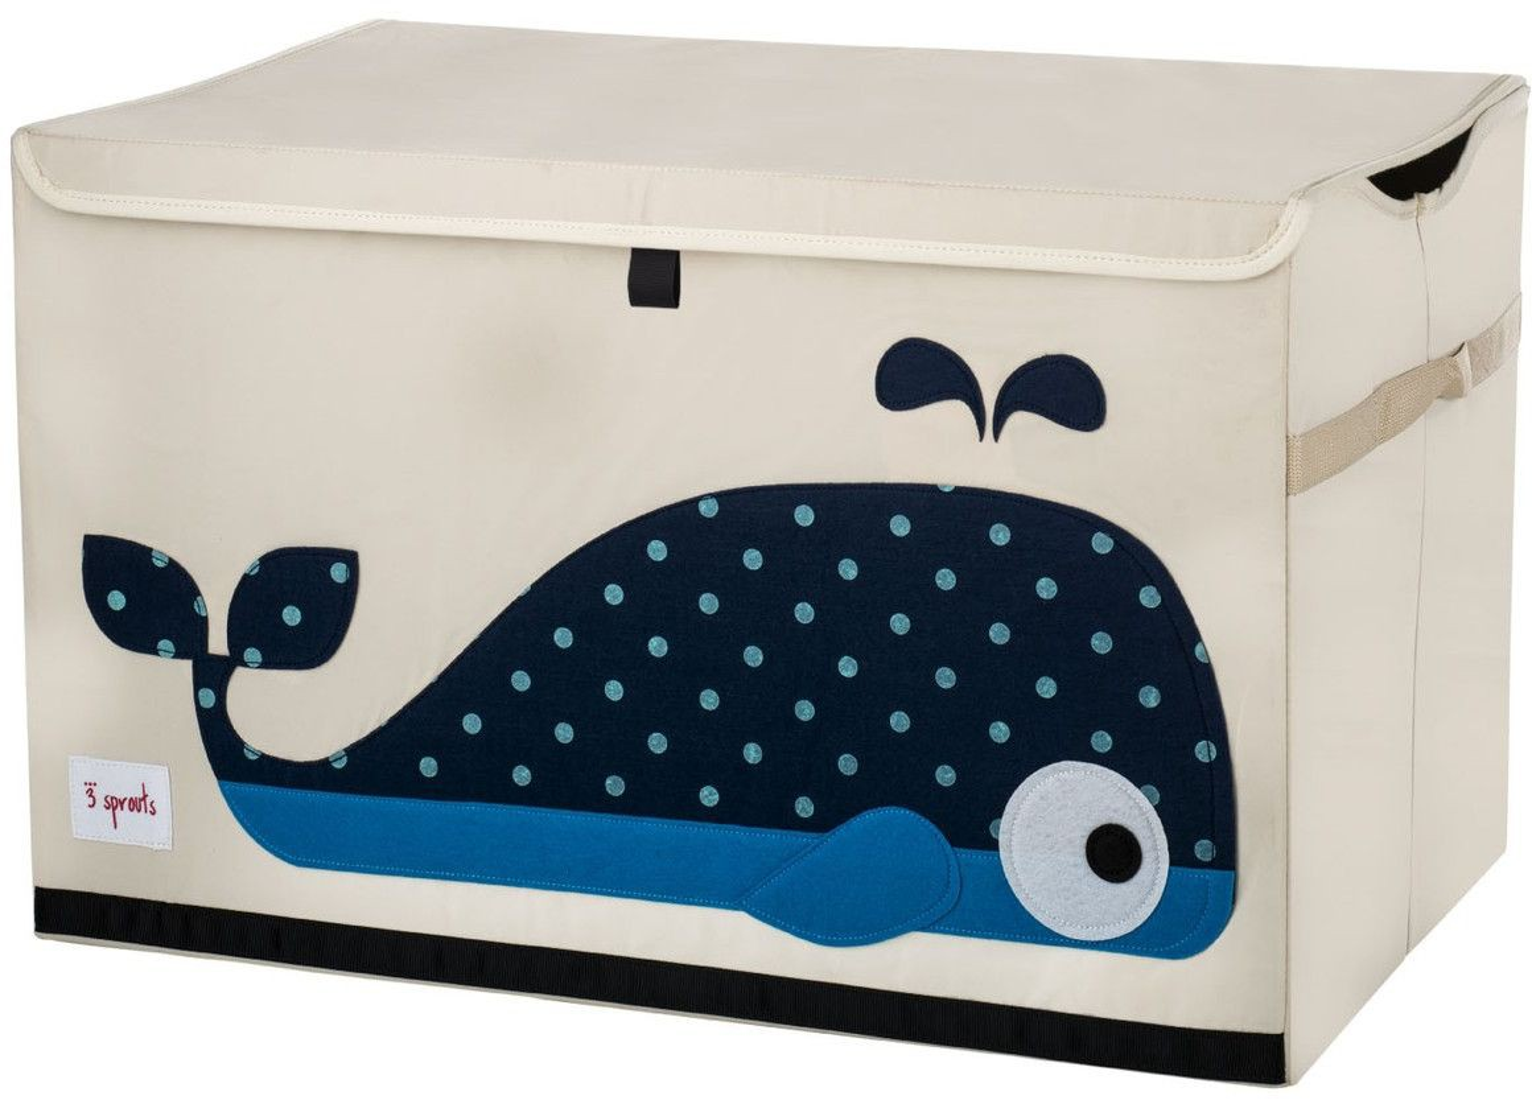 3 sprouts spielzeug kiste wal. Black Bedroom Furniture Sets. Home Design Ideas